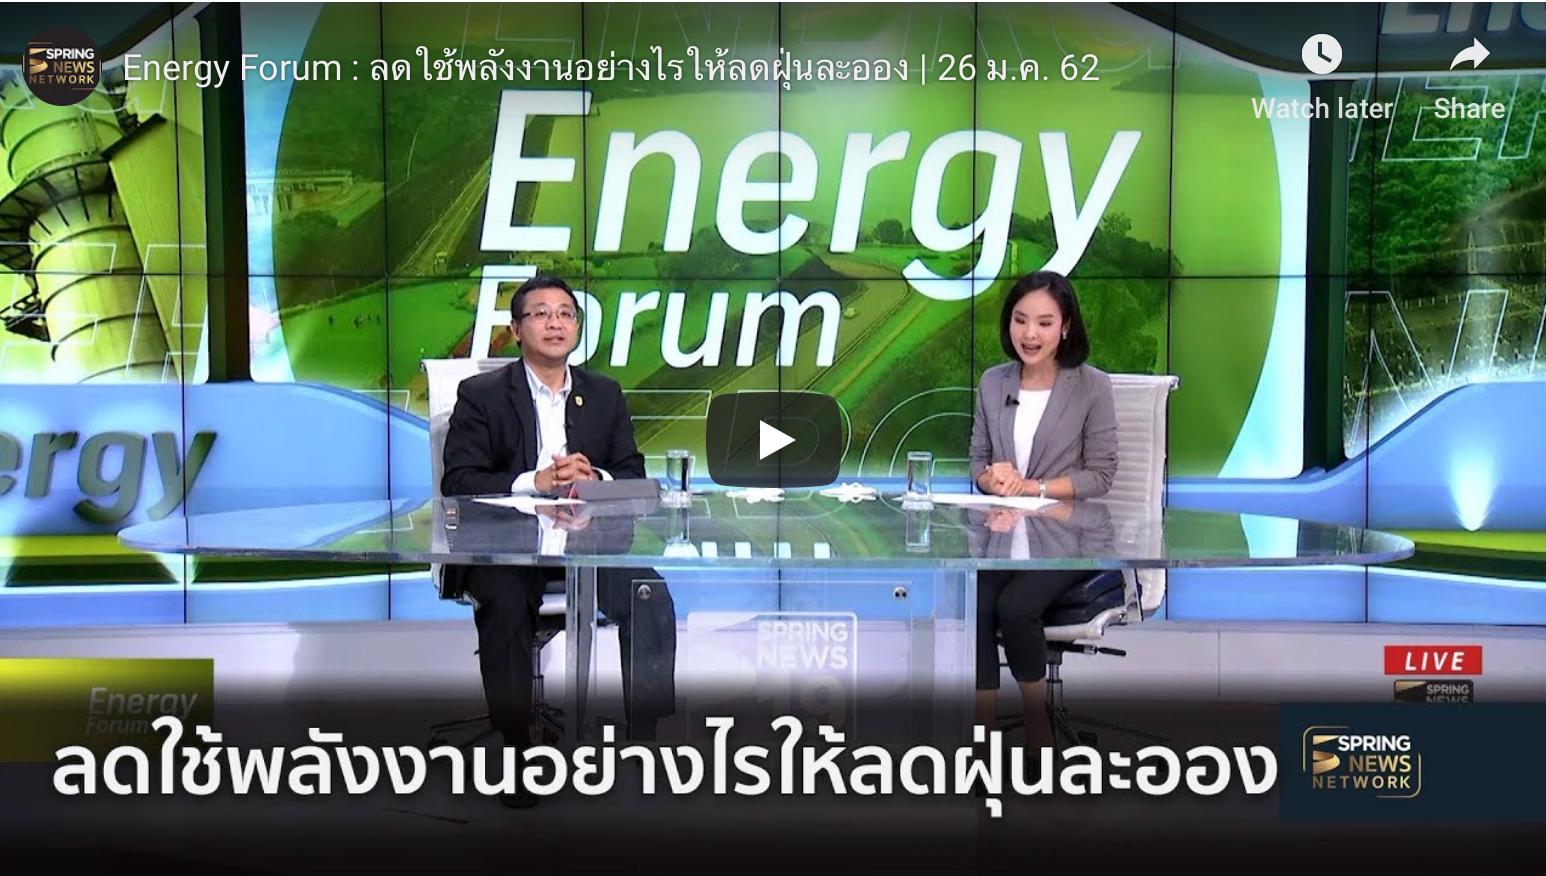 Energy Forum : ลดใช้พลังงานอย่างไรให้ลดฝุ่นละออง | 26 ม.ค. 62